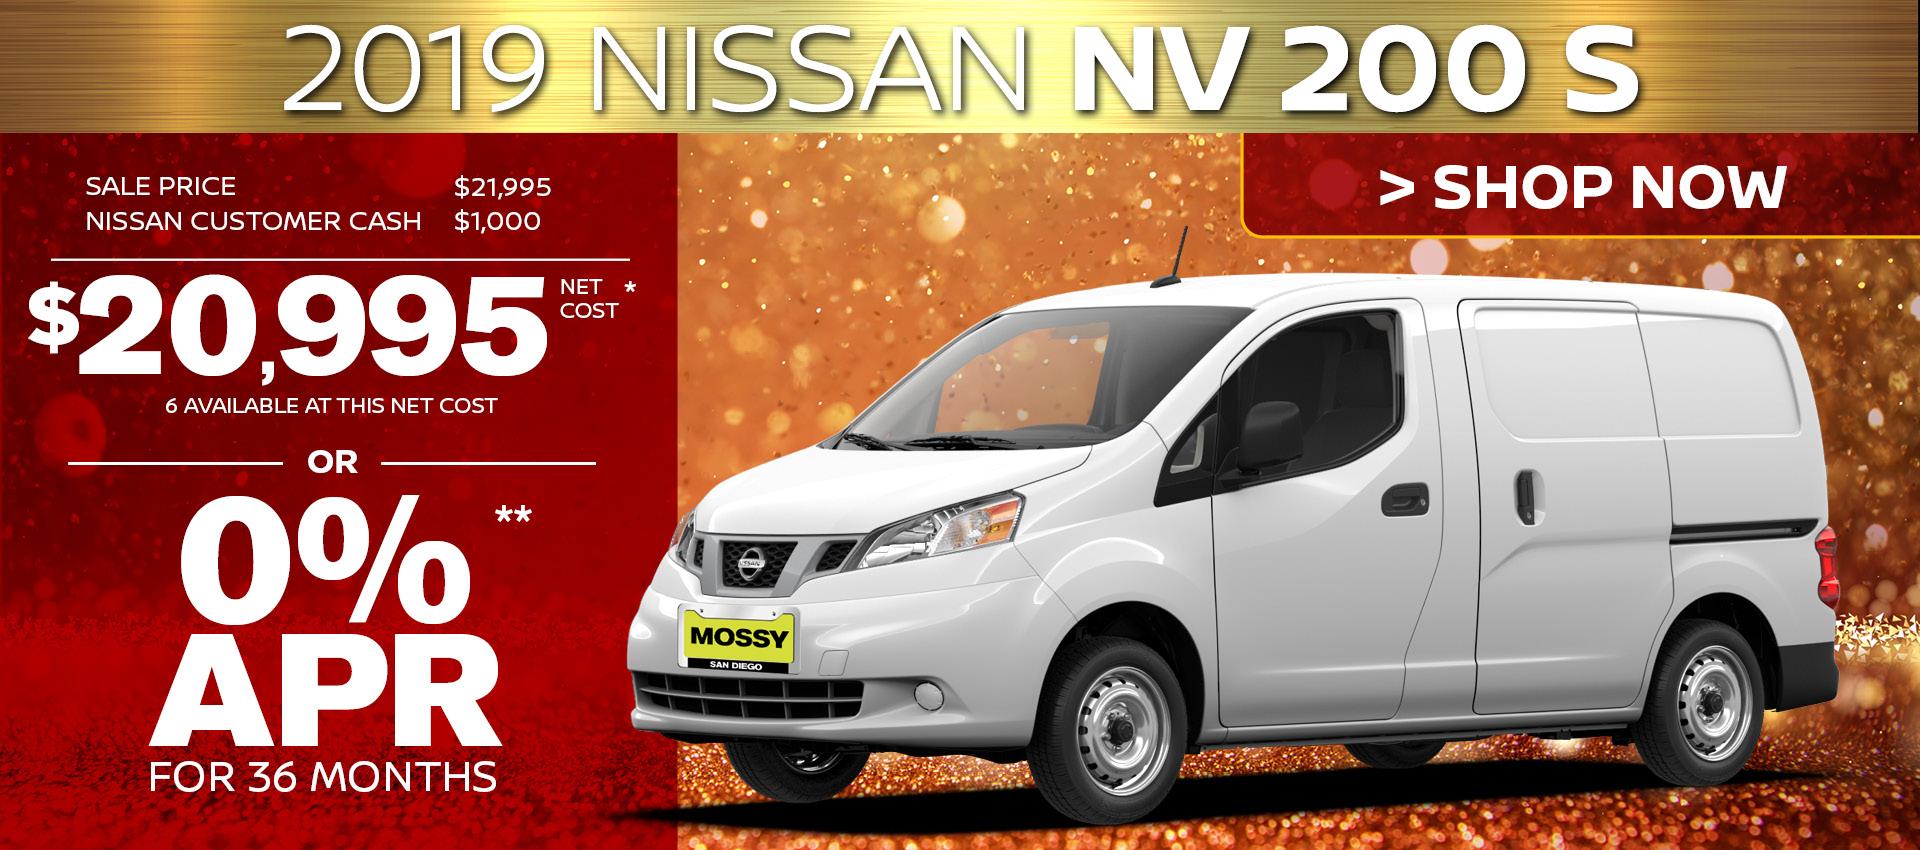 Mossy Nissan - NV200 HP